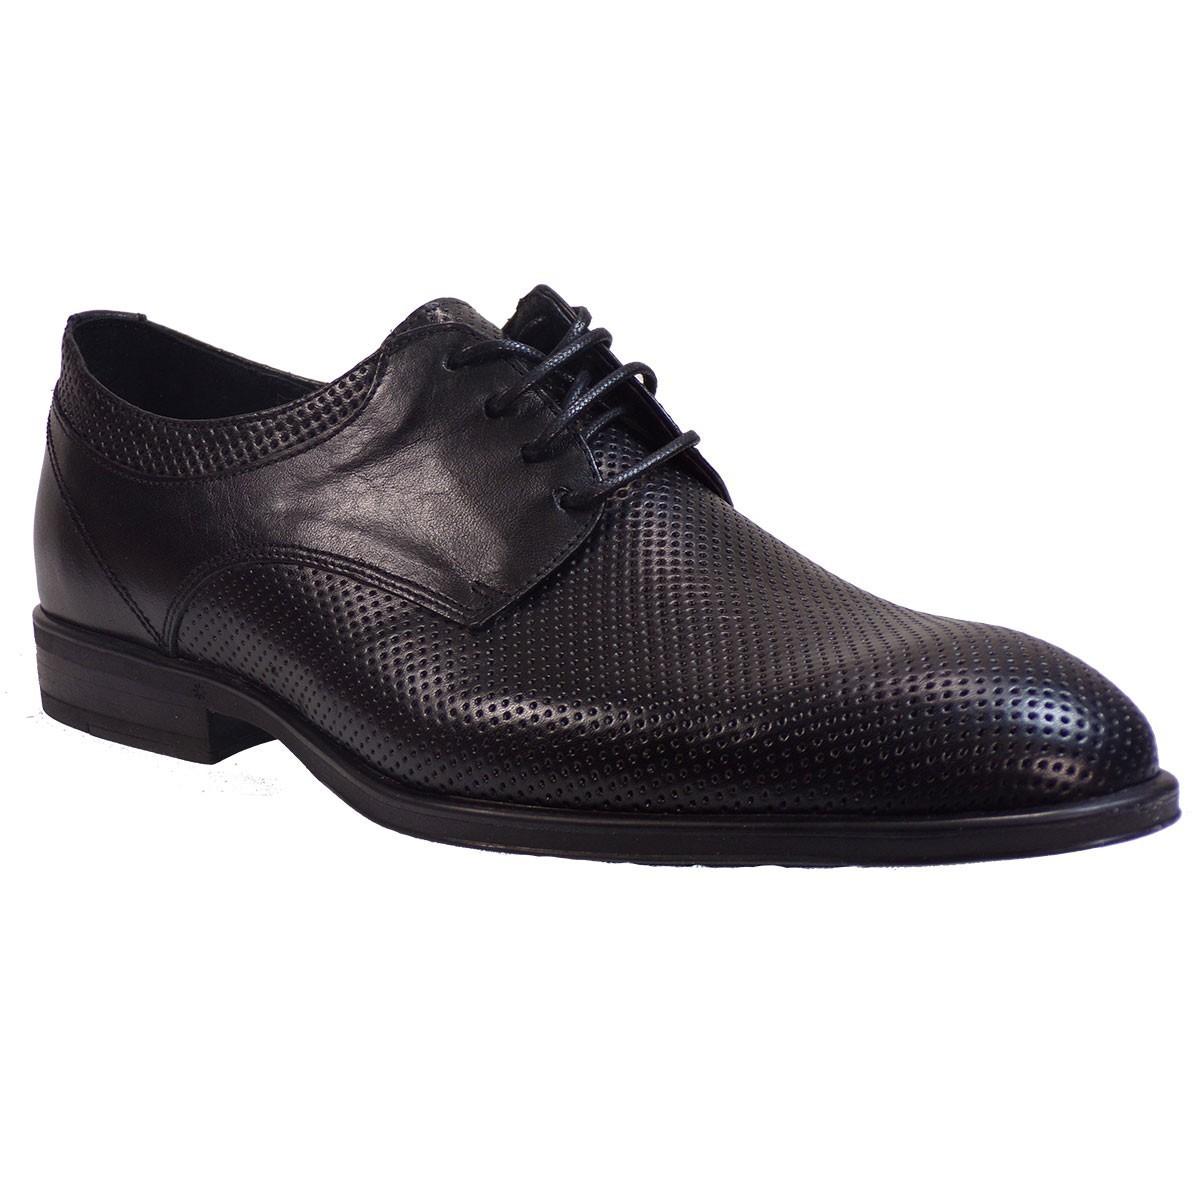 kricket Ανδρικά Παπούτσια 600Λ Μαύρο Δέρμα